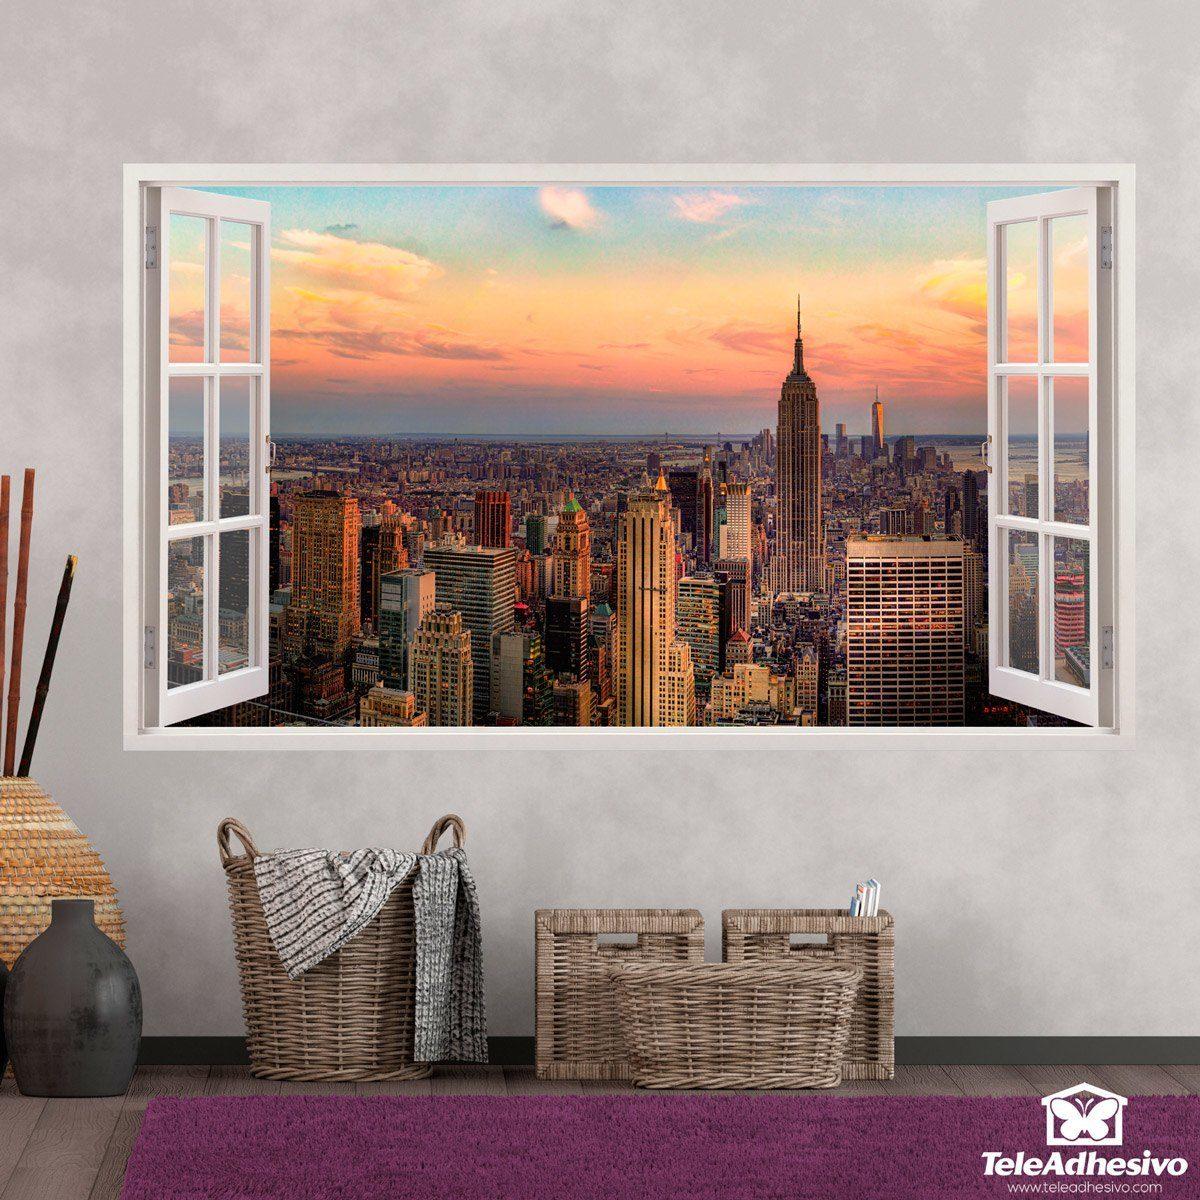 Pegatinas para decorar con forma de ventana teleadhesivo for Vinilos pared new york